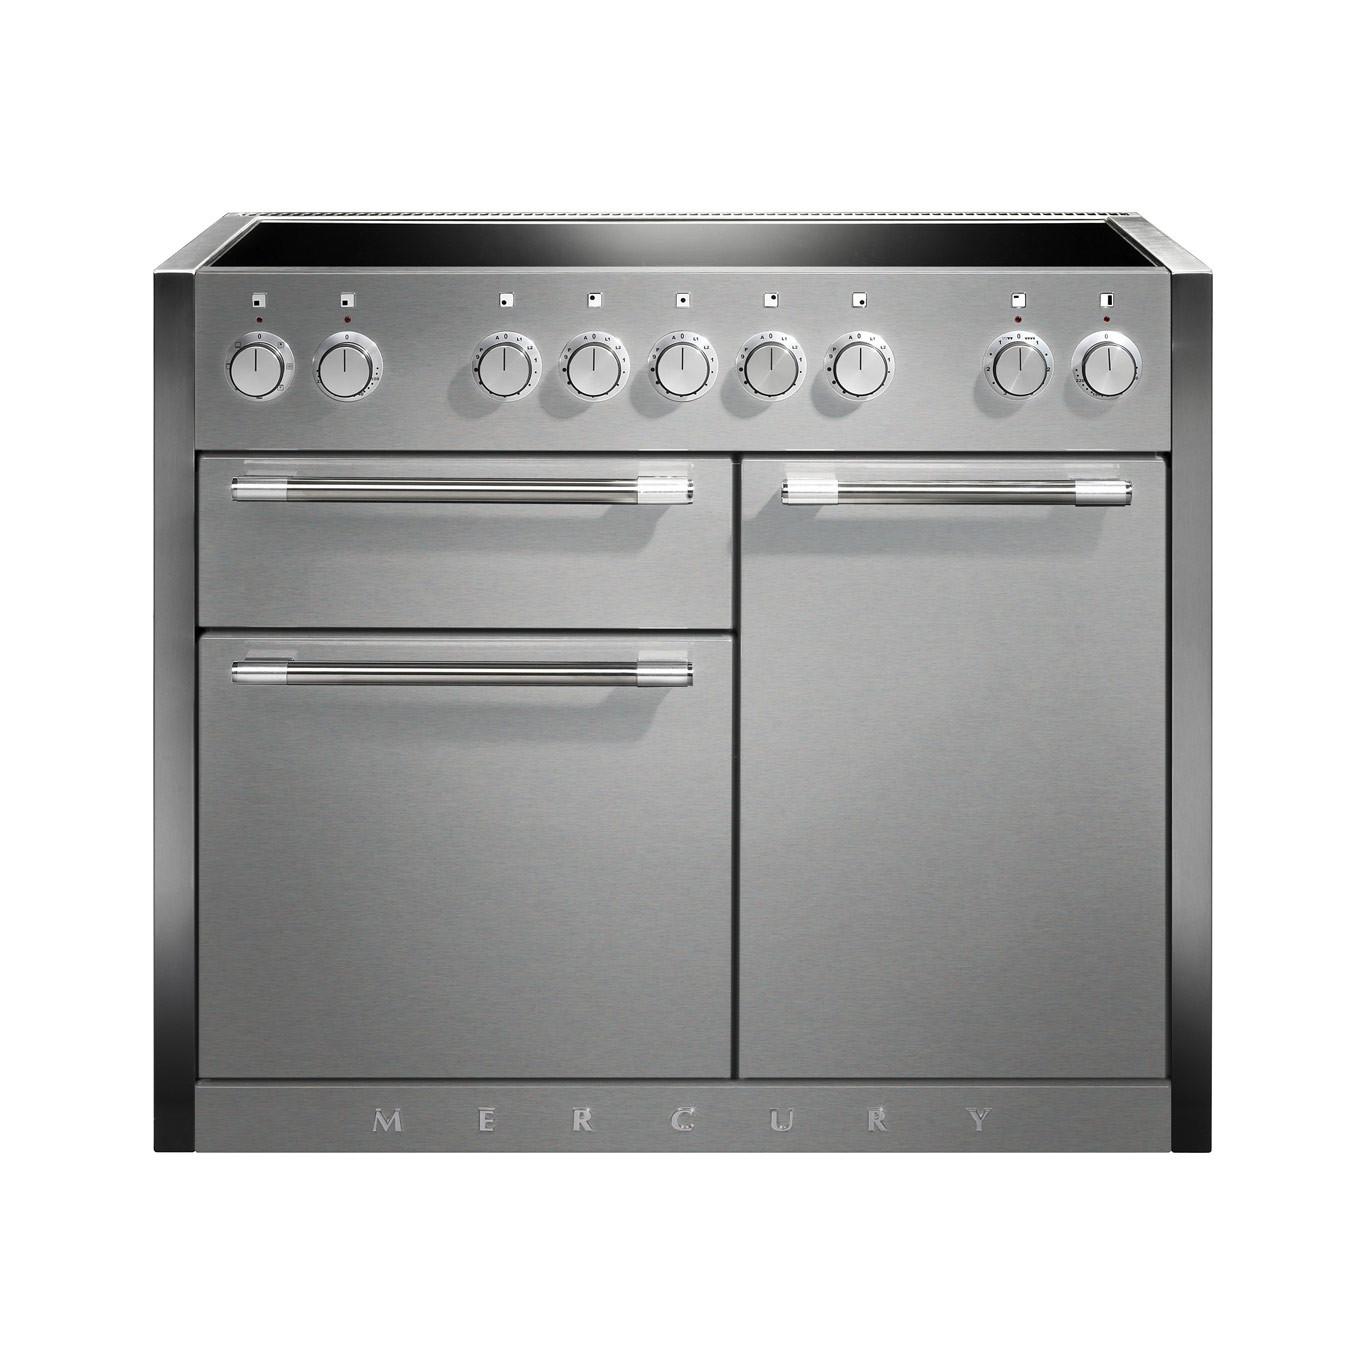 Mercury MCY1082EI Induction Stainless Steel Range Cooker